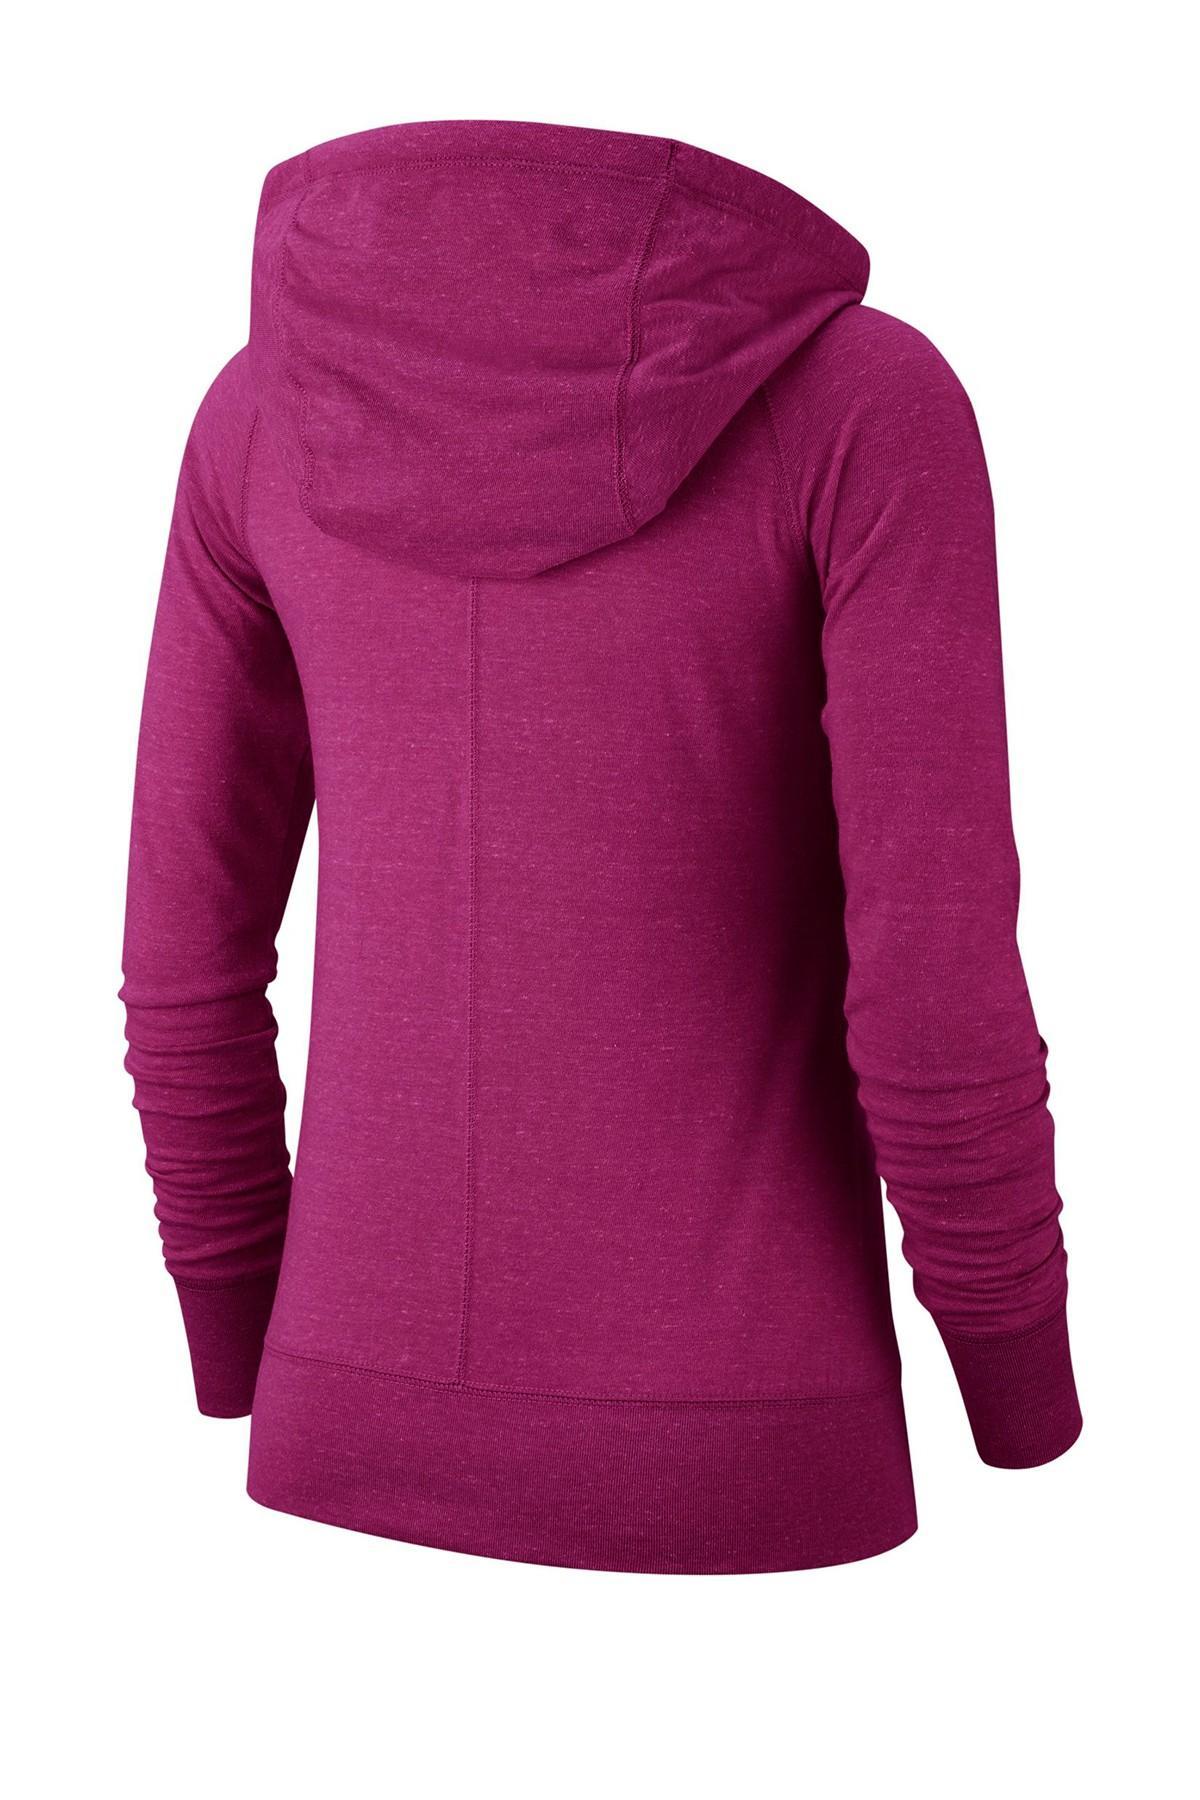 97a3cca418 Nike - Purple Vintage Drawstring Hoodie - Lyst. View fullscreen